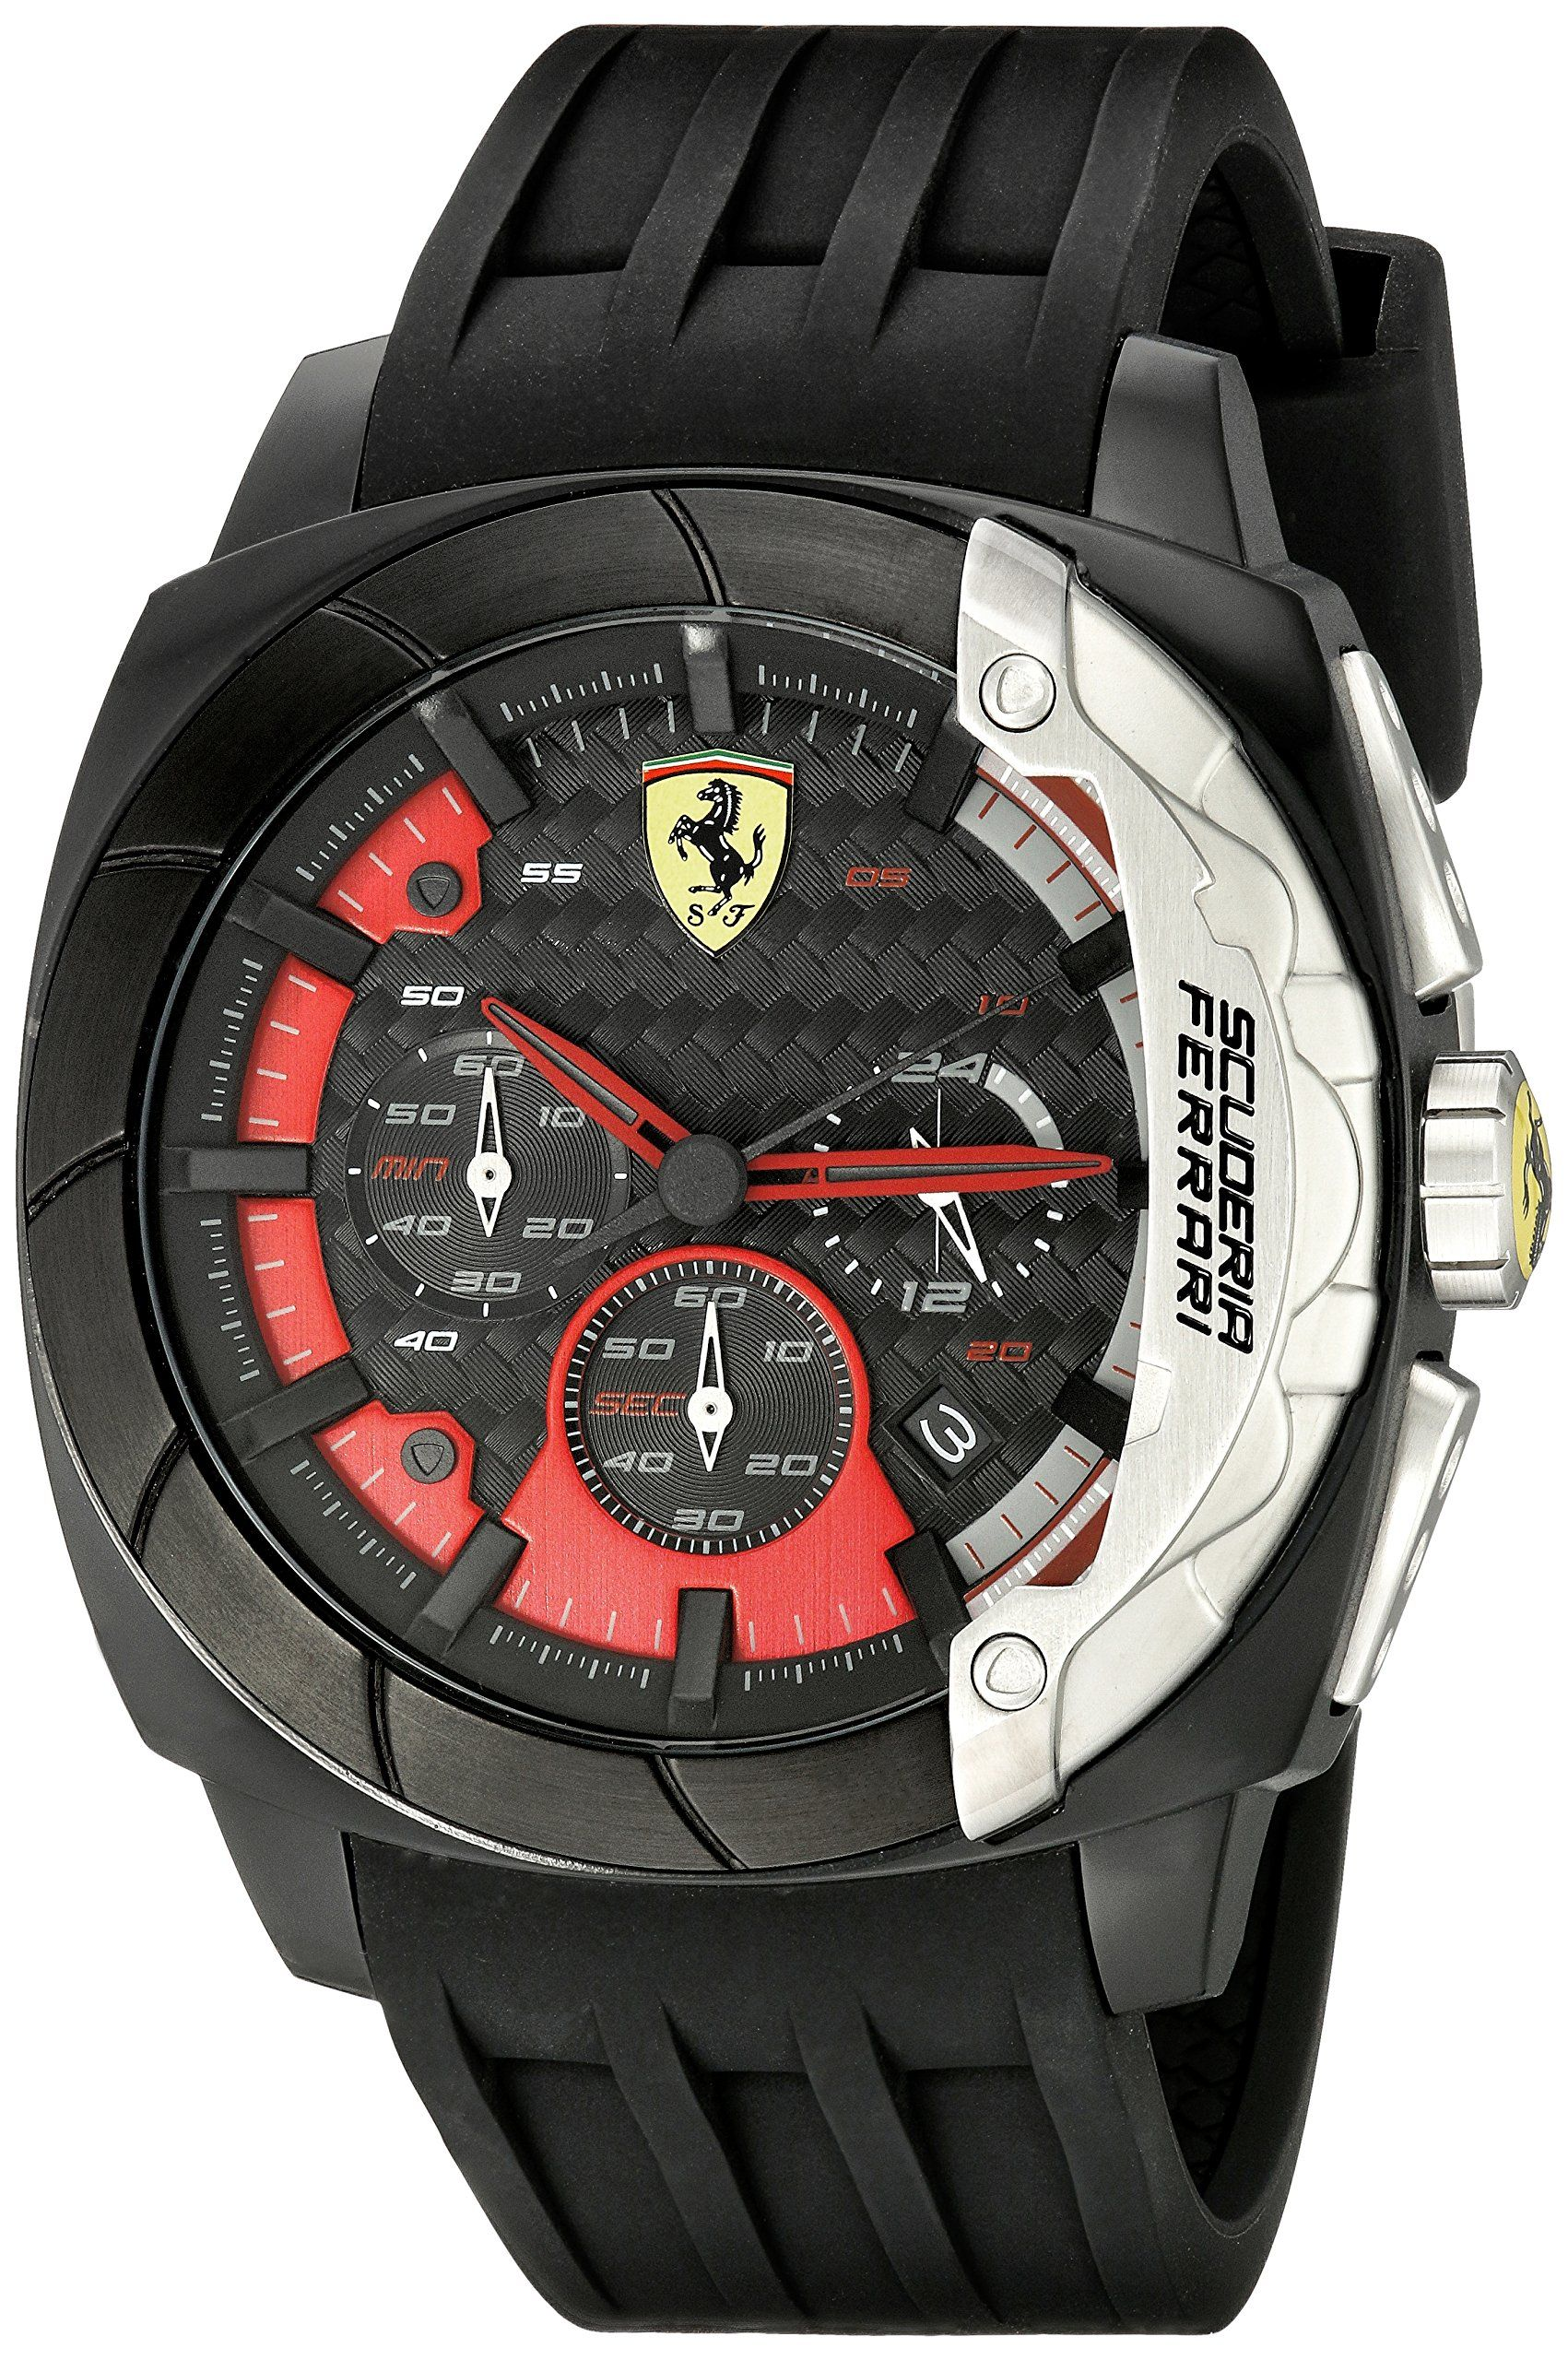 035b1b0442f Ferrari Men s 830205 Aerodinamico Analog Display Quartz Black Watch ...